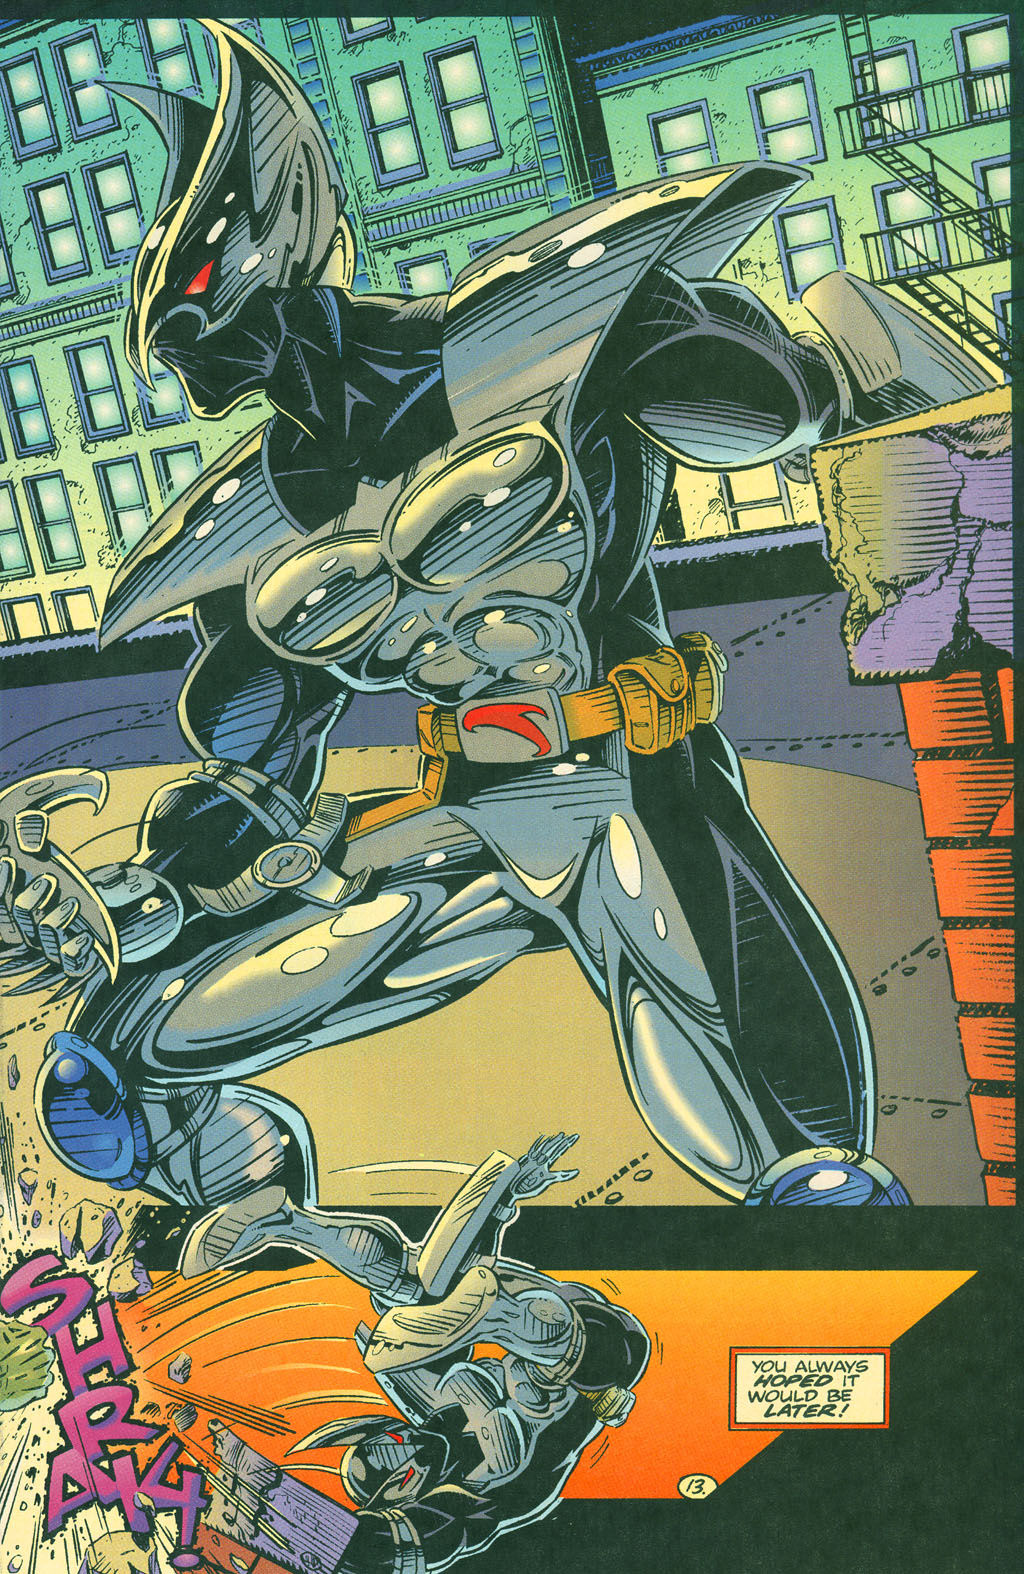 Read online ShadowHawk comic -  Issue #4 - 17